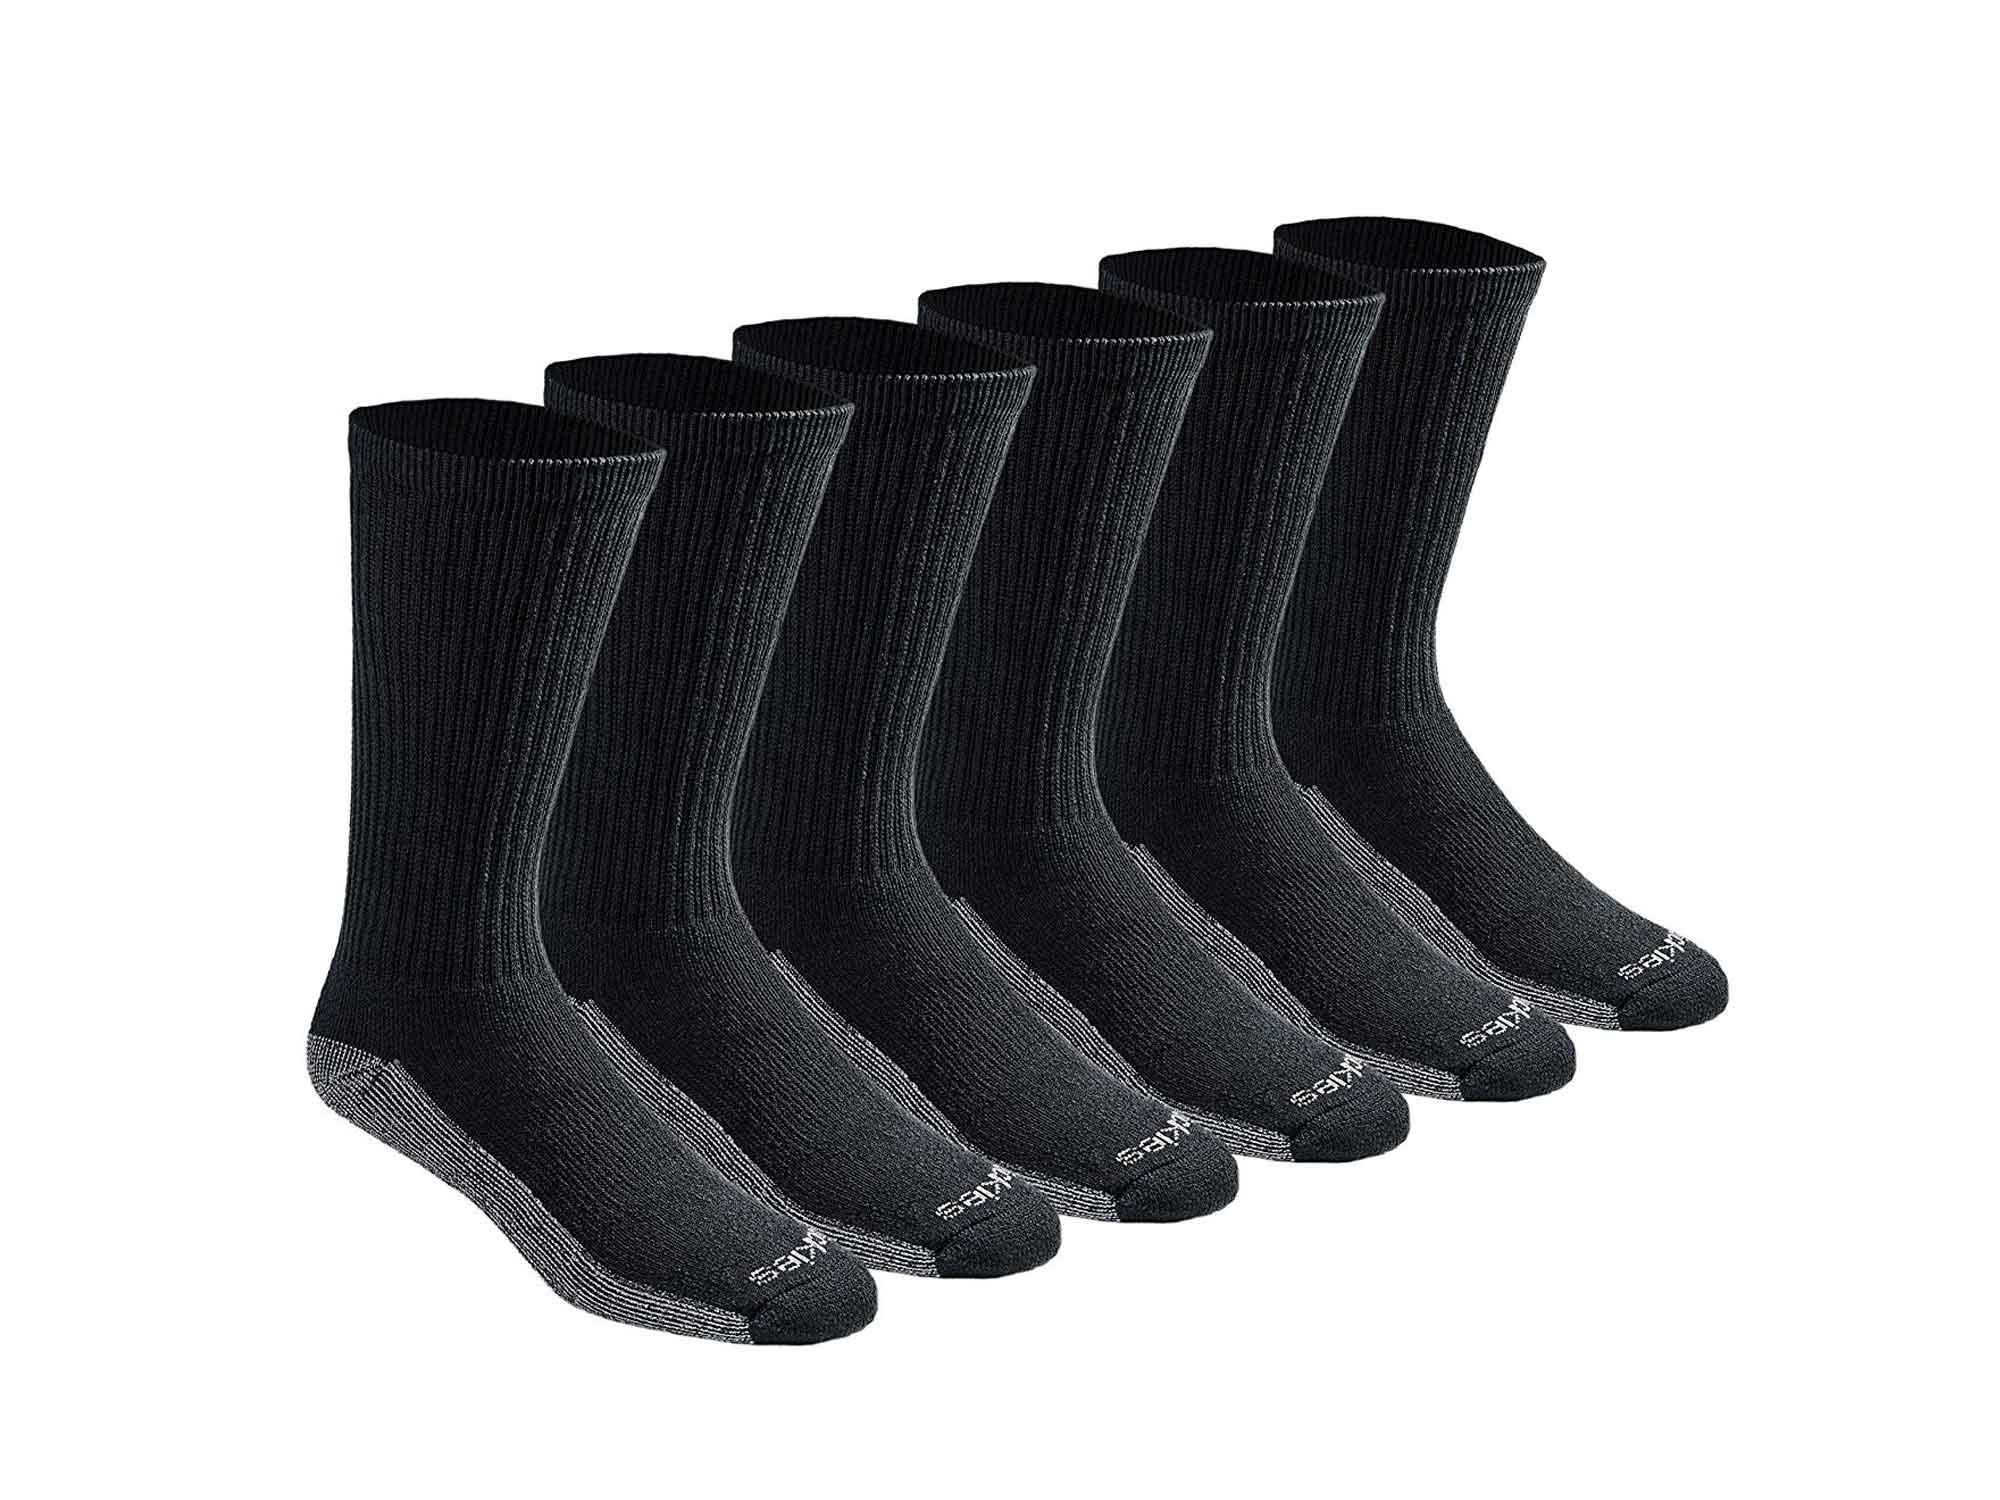 Dickies black thick socks